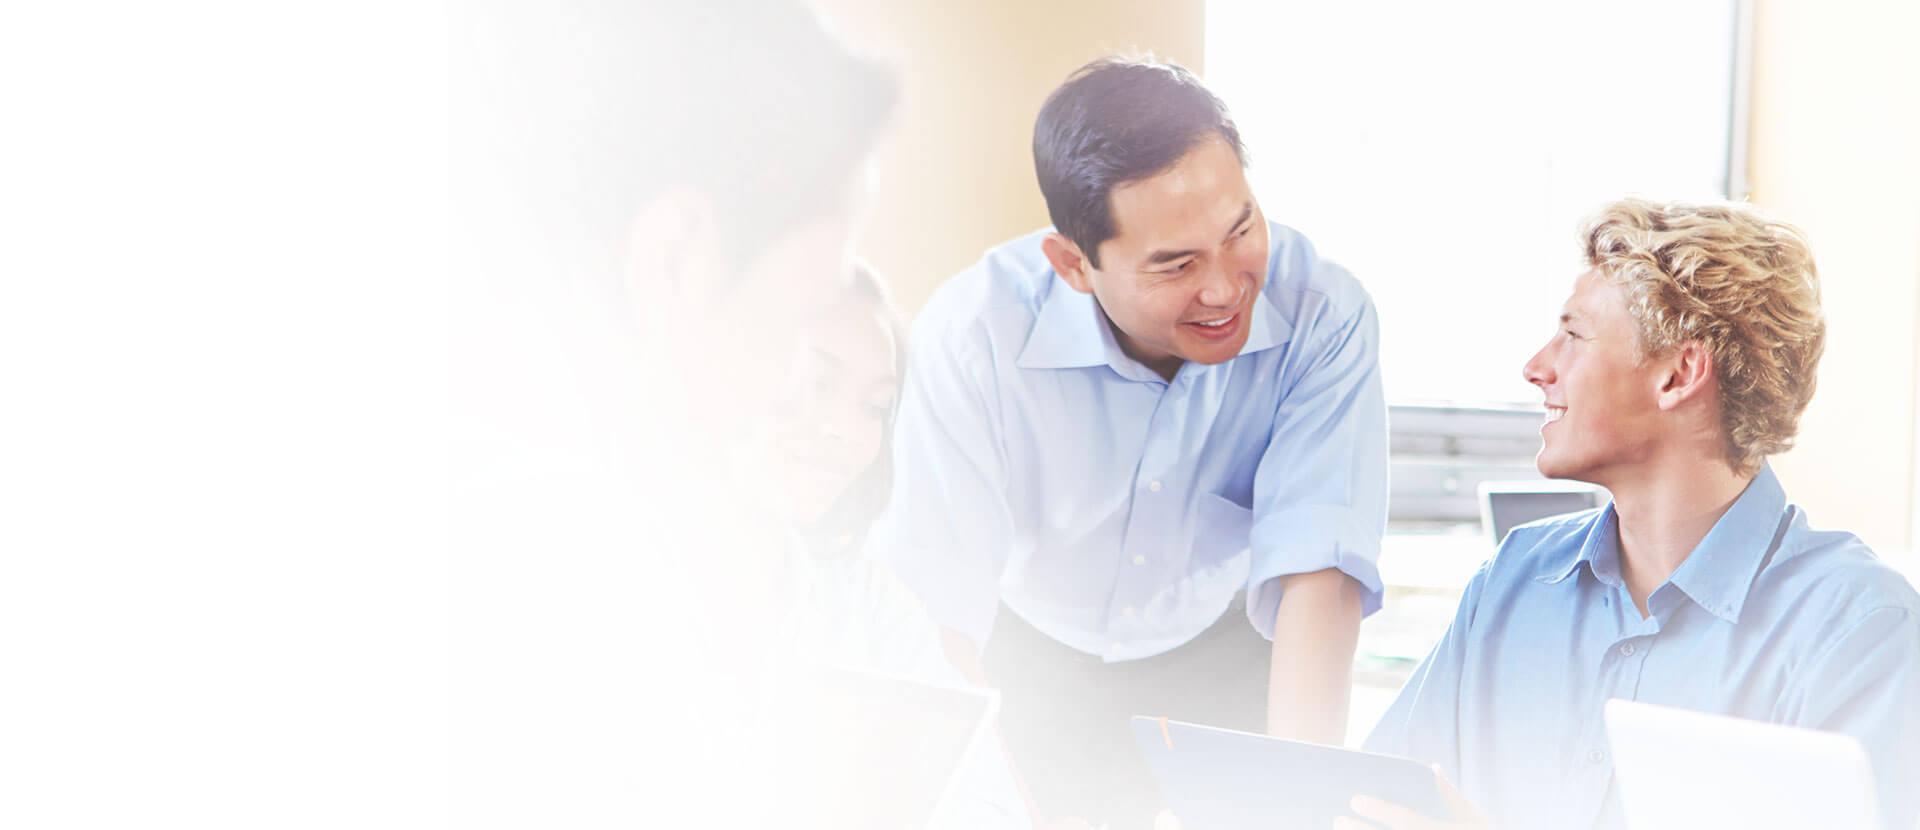 101FAQ系统互联网型学习交互平台,为教师提供快速助教、线上答疑